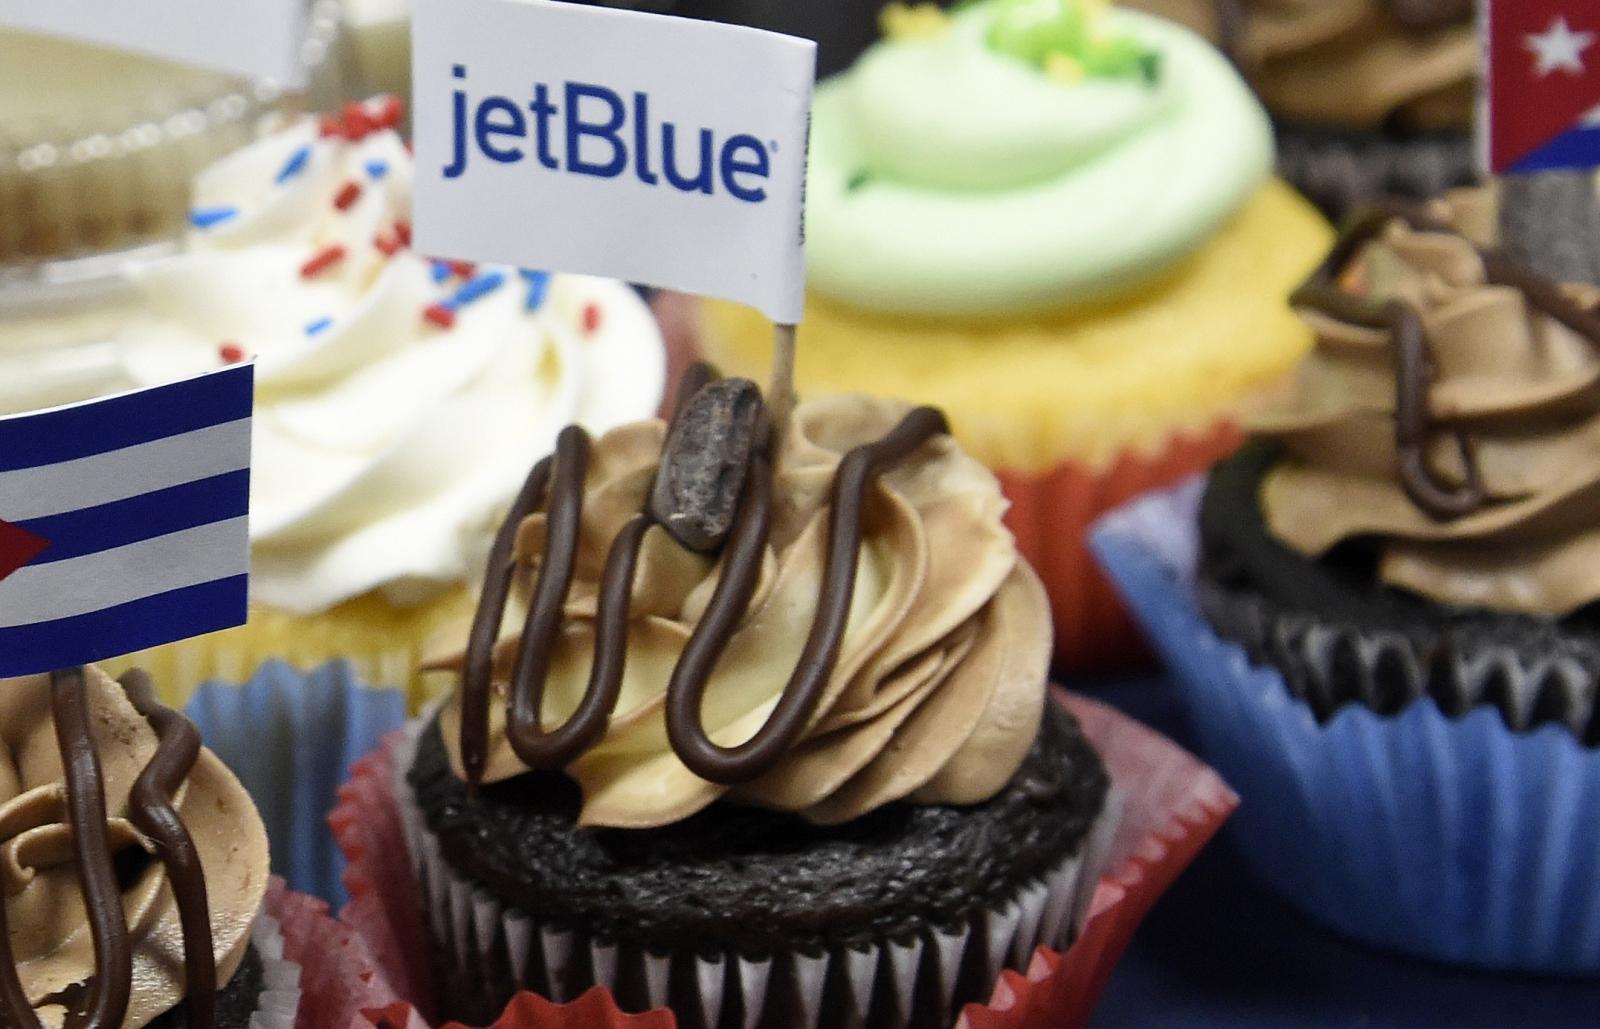 JetBlue cupcakes